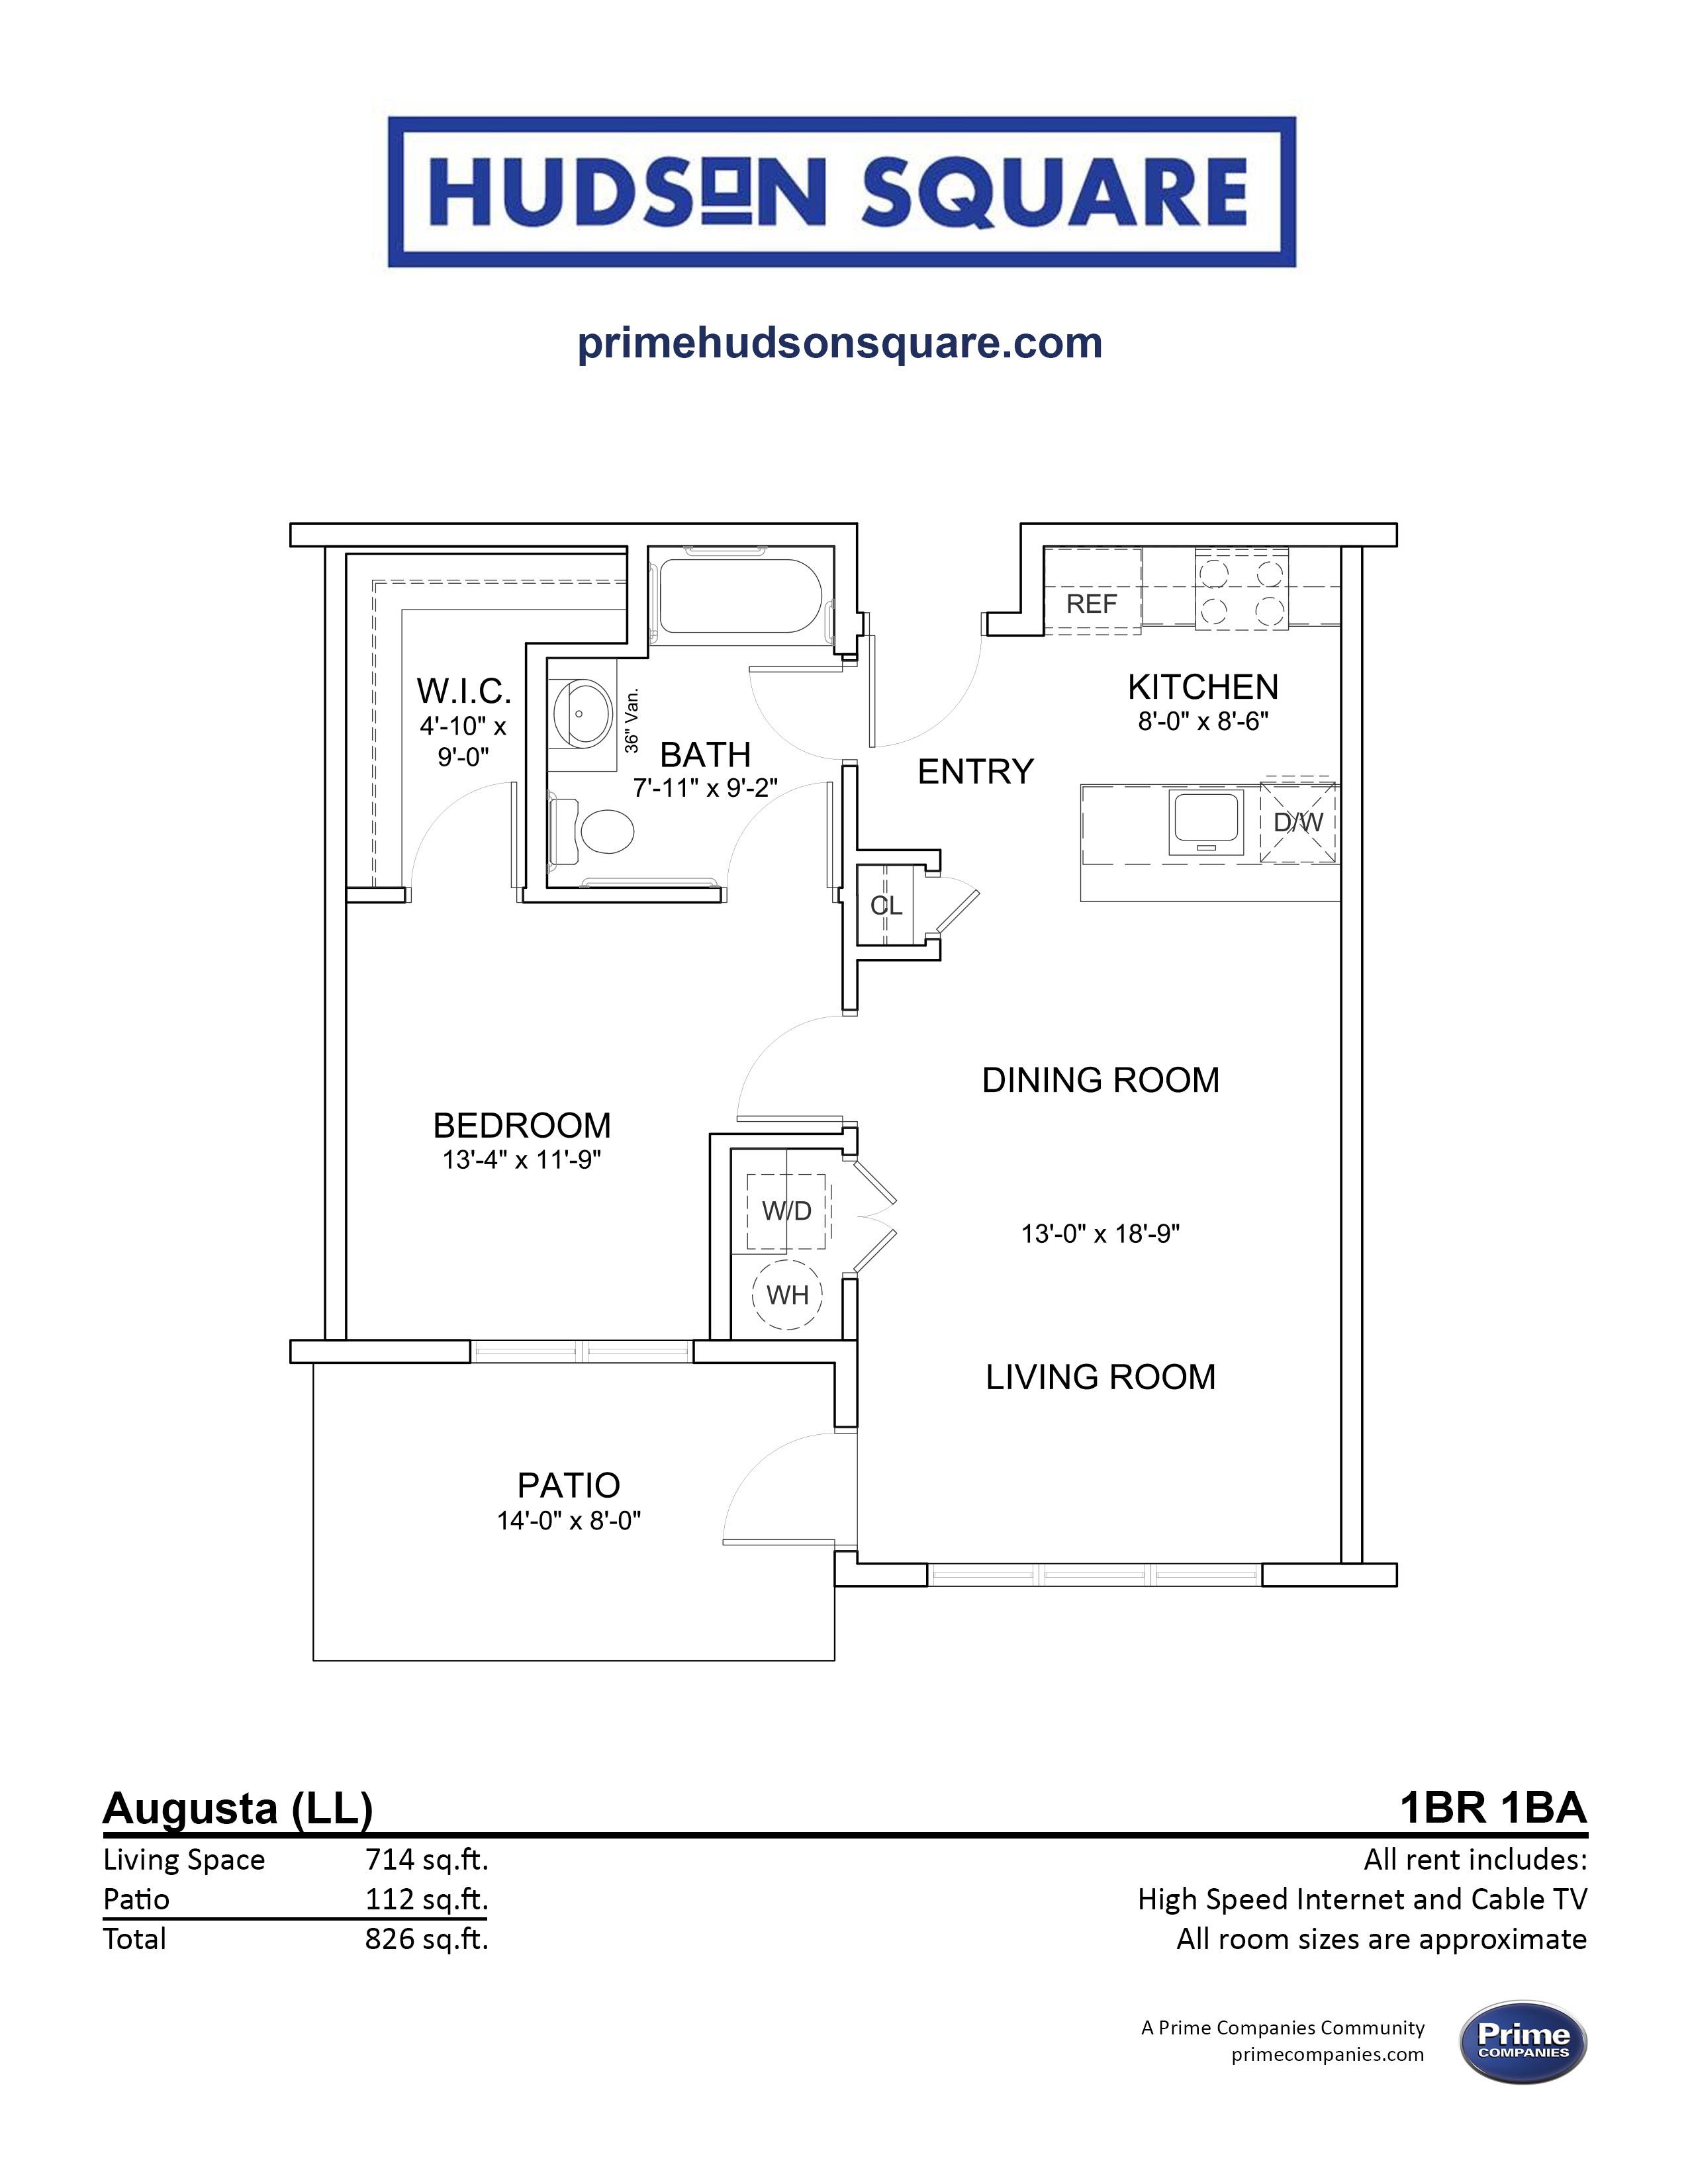 Augusta Lower Level Floorplan 1 bedroom 1 bath apartment